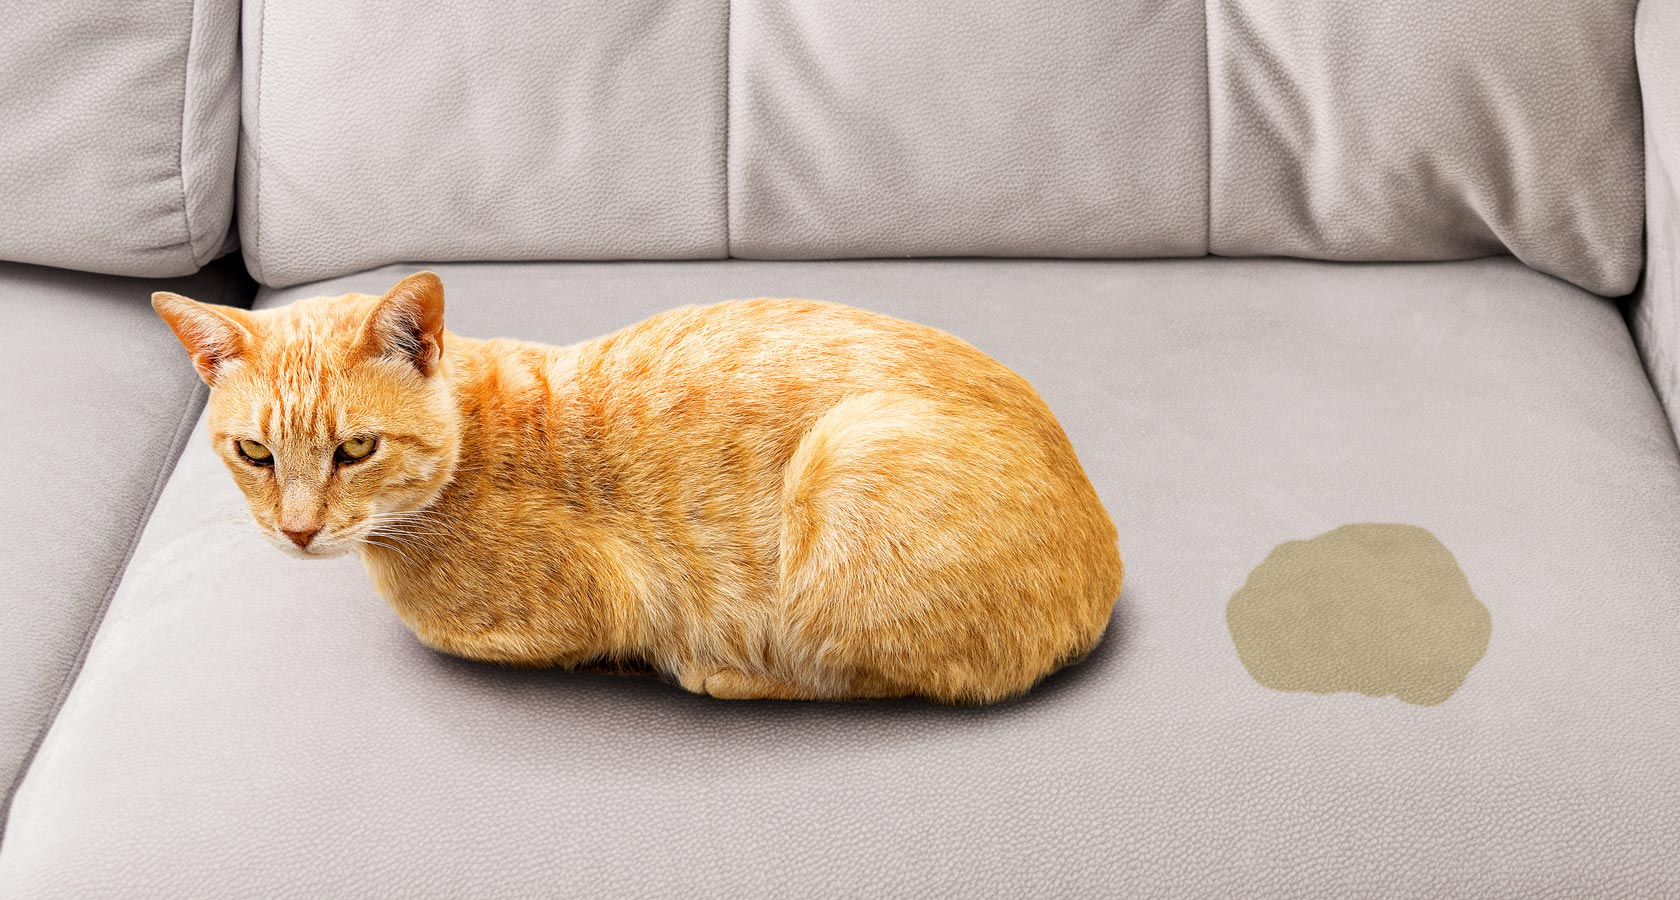 Aprende a quitar el olor de orina de gatos